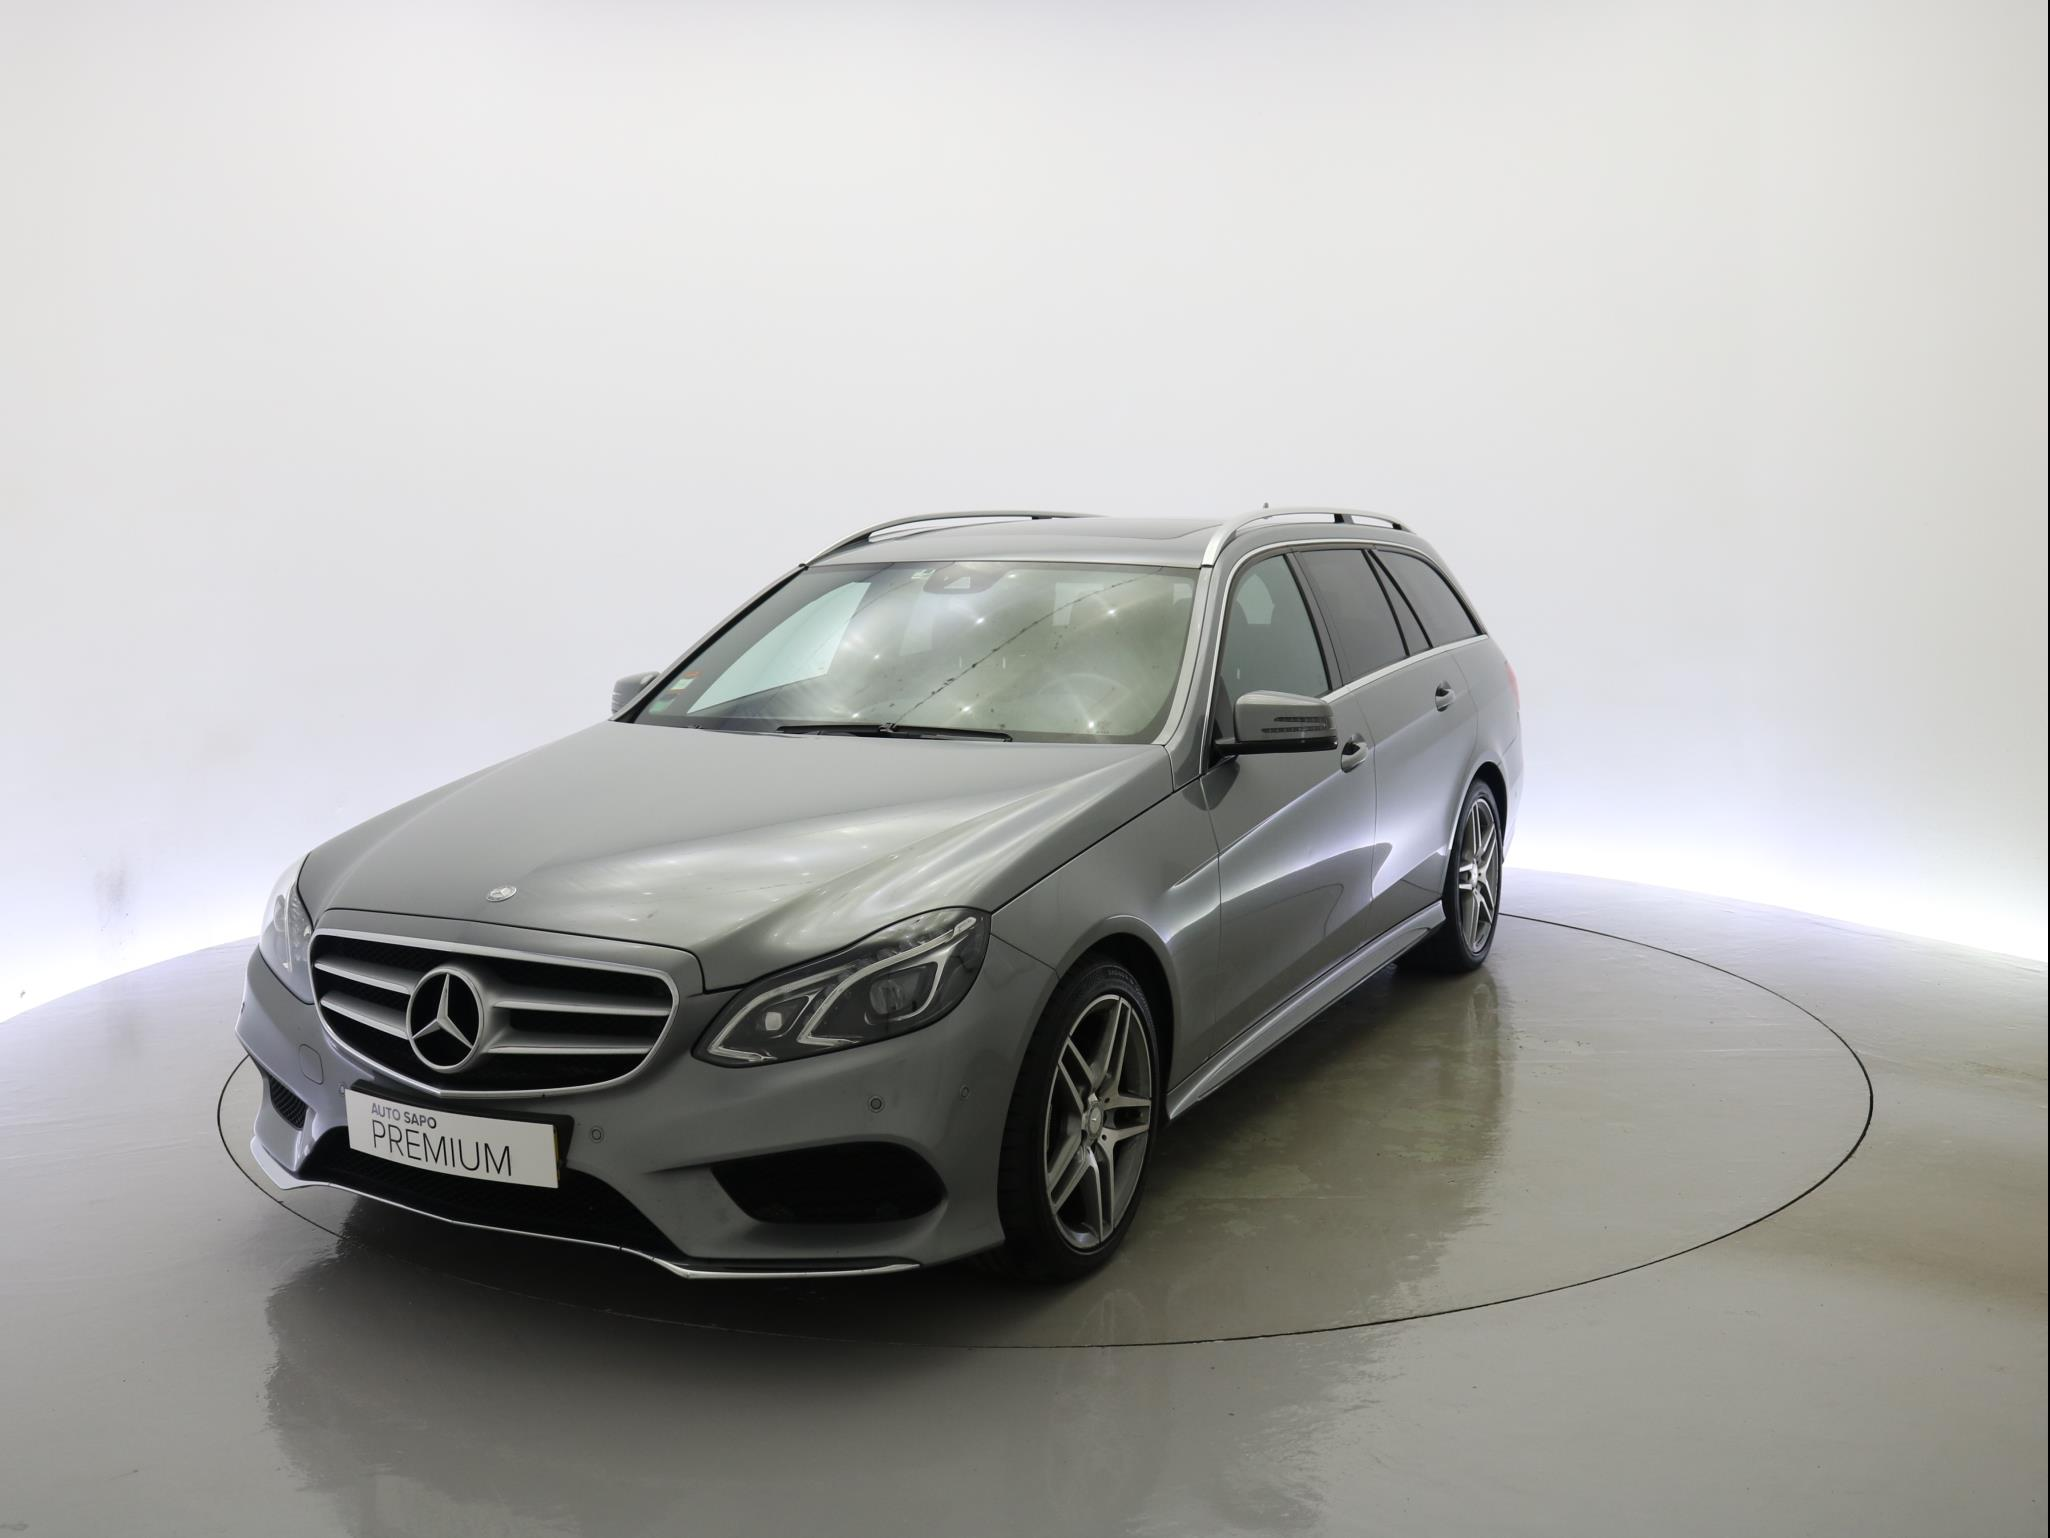 Mercedes-Benz Classe E 250 CDI BE AMG Line